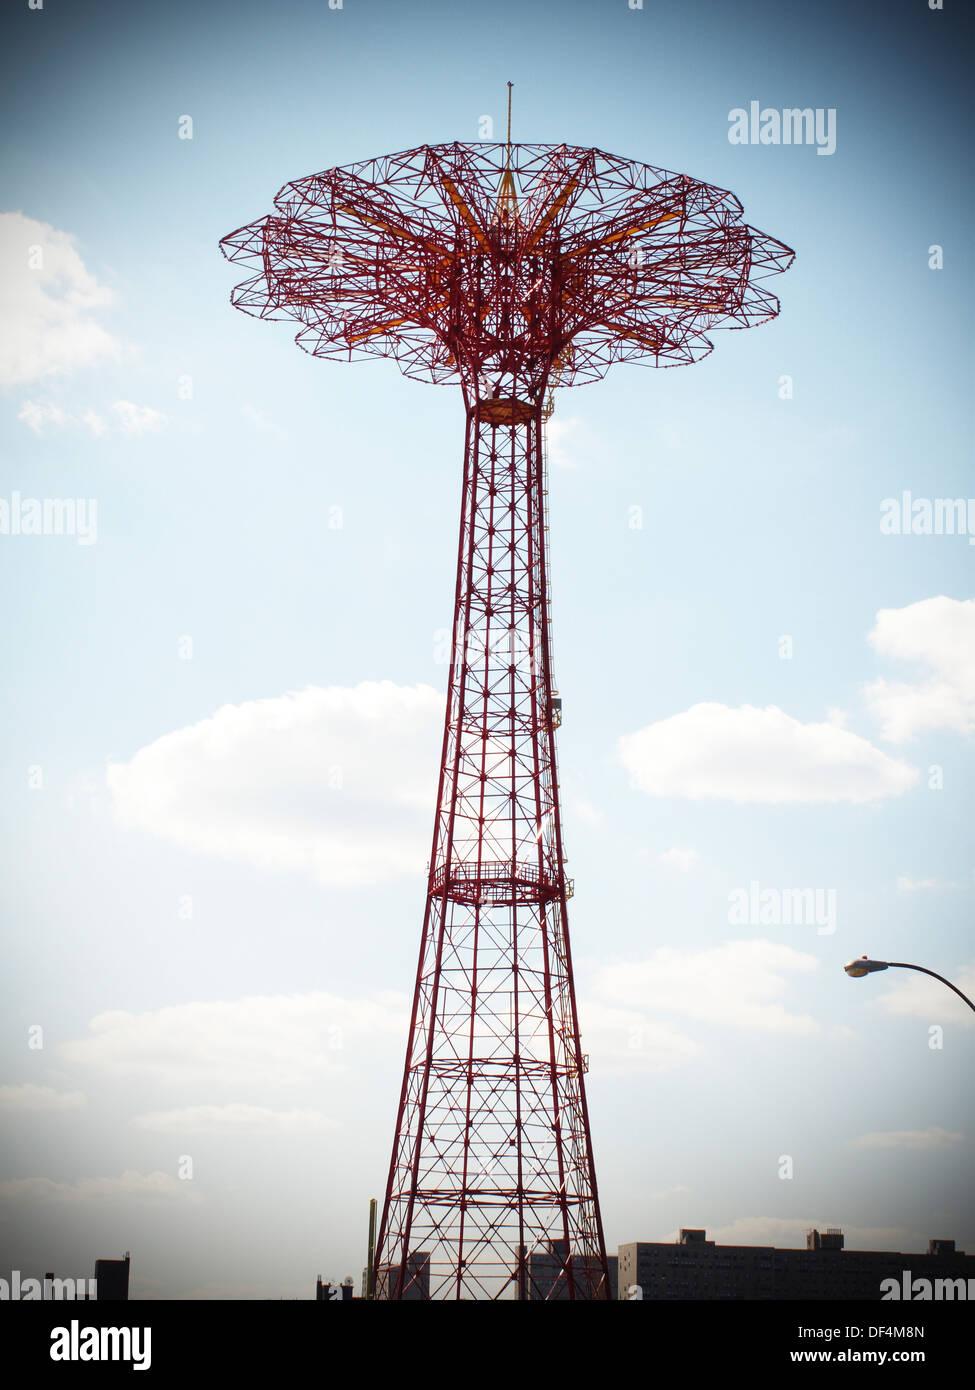 Parachute Ride, Coney Island, New York City, USA - Stock Image